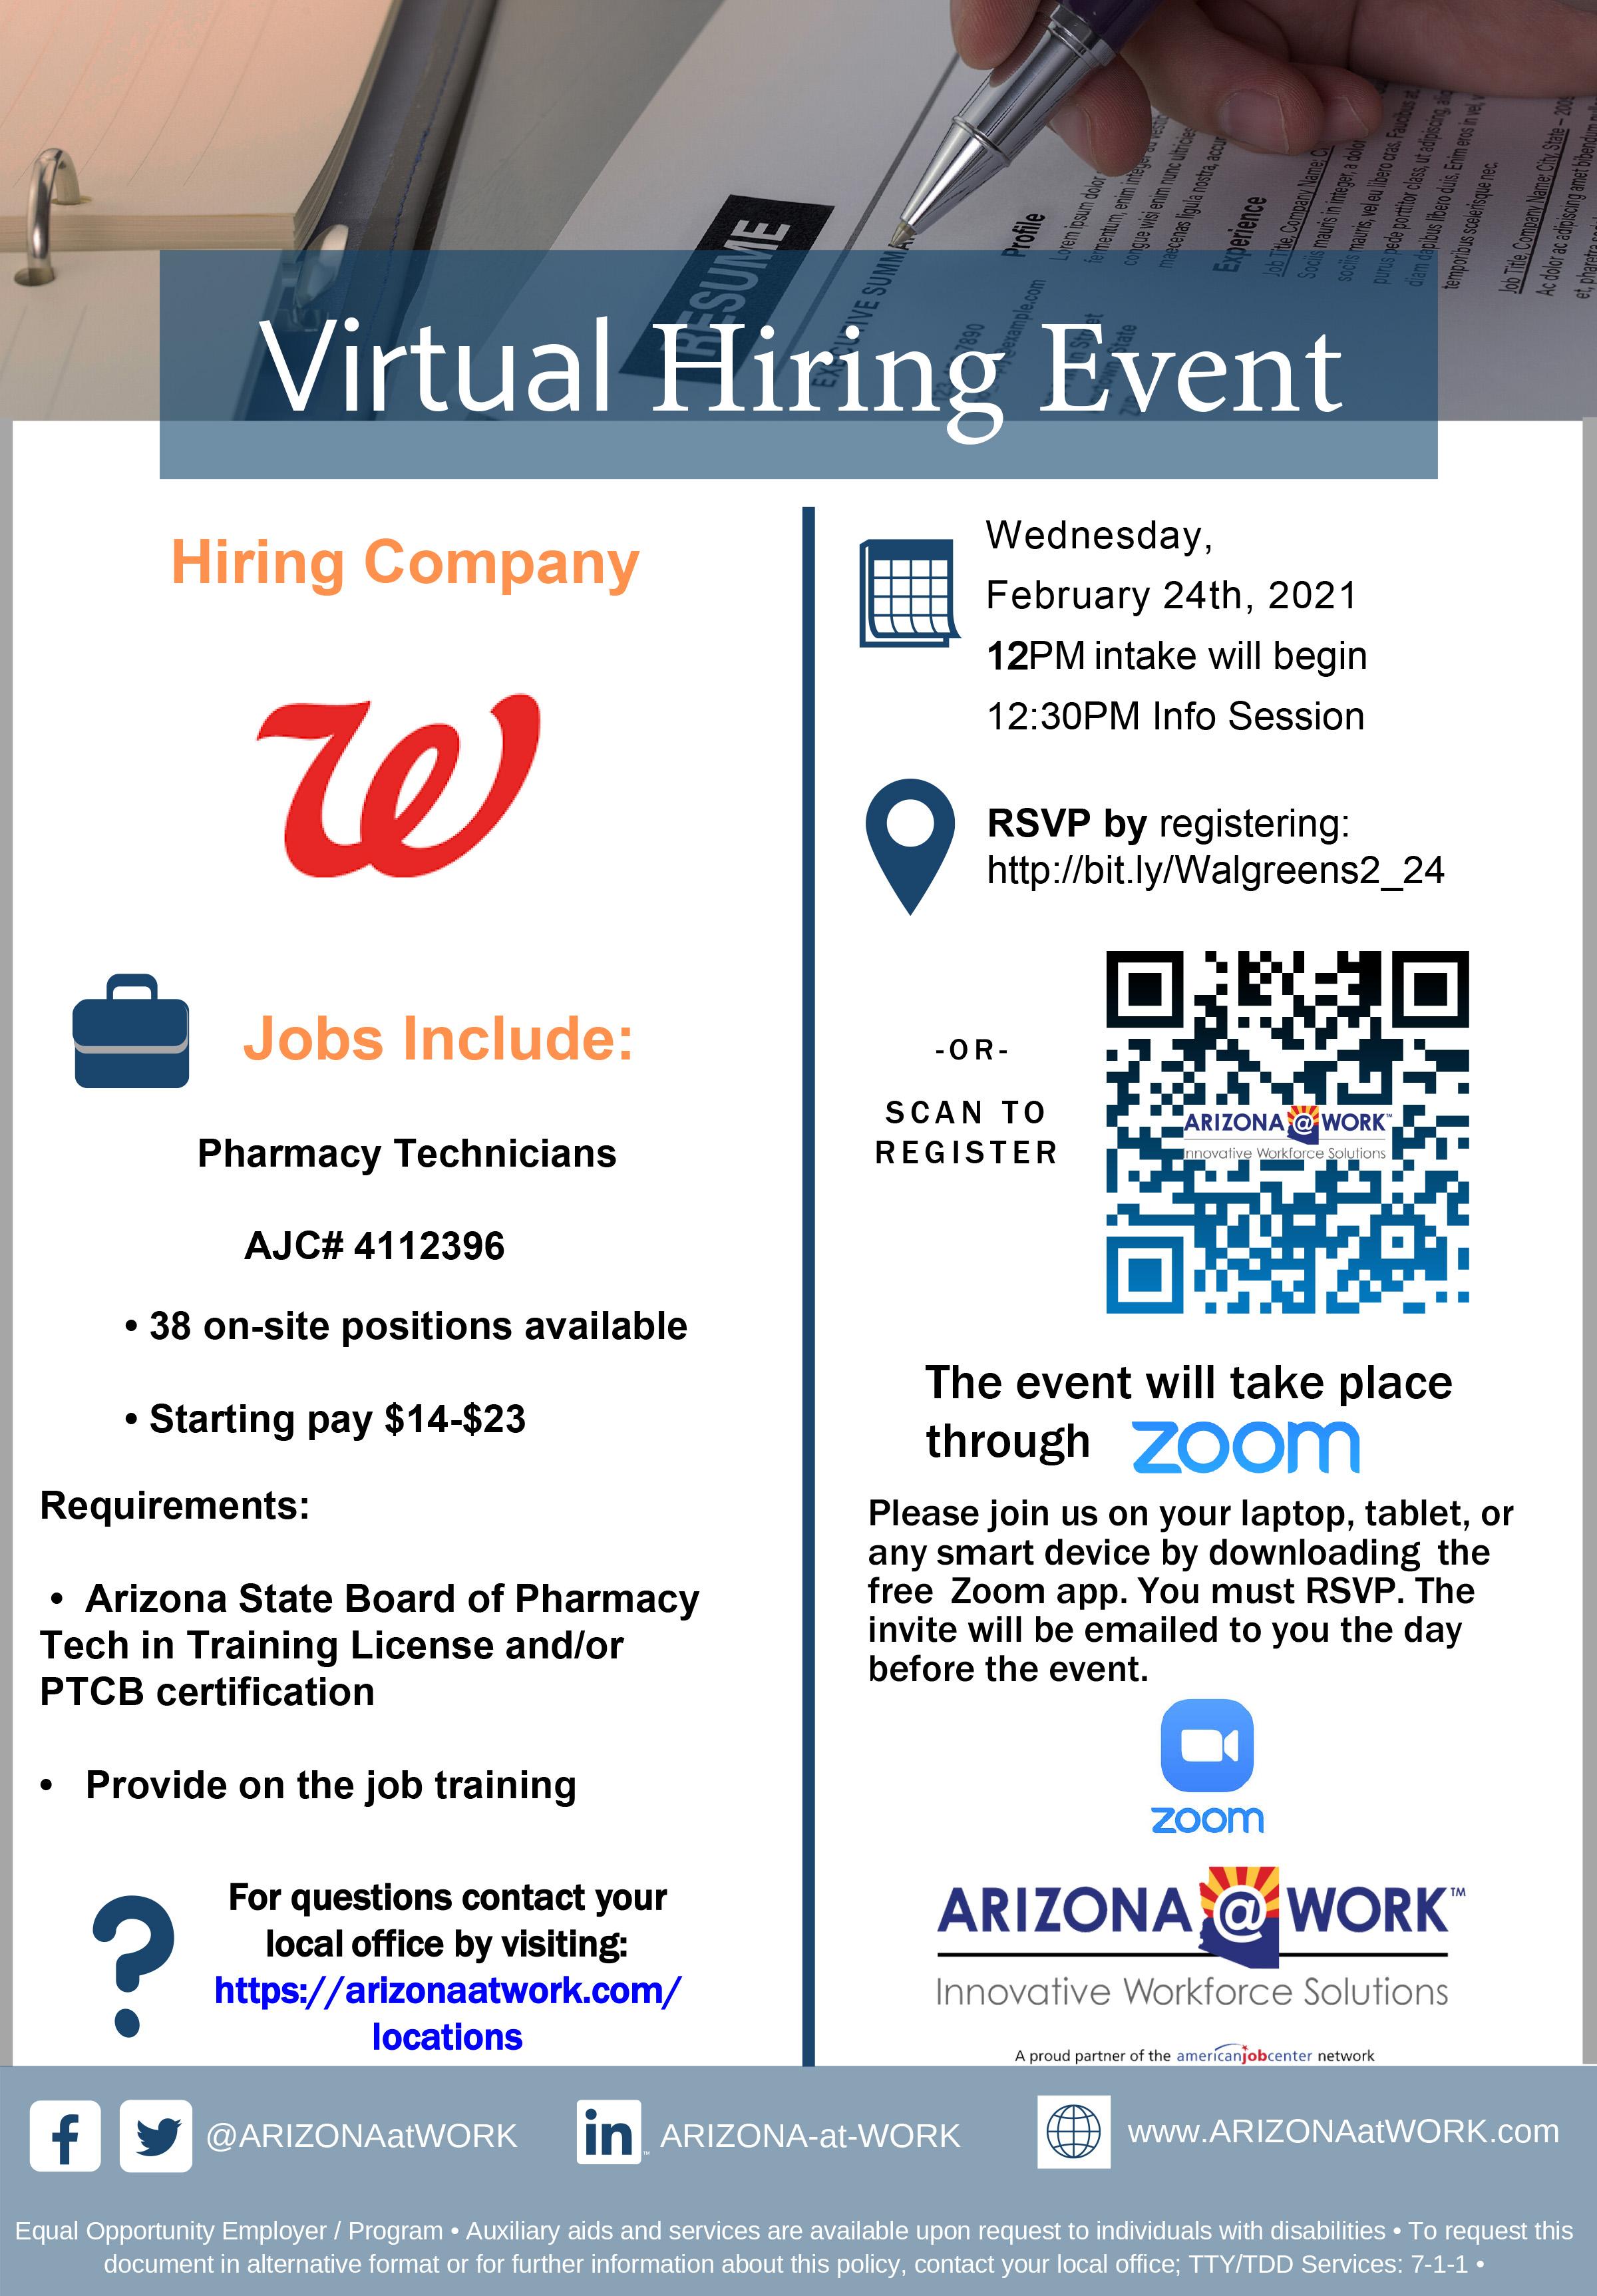 Walgreens Virtual Hiring Event 2-24-2021